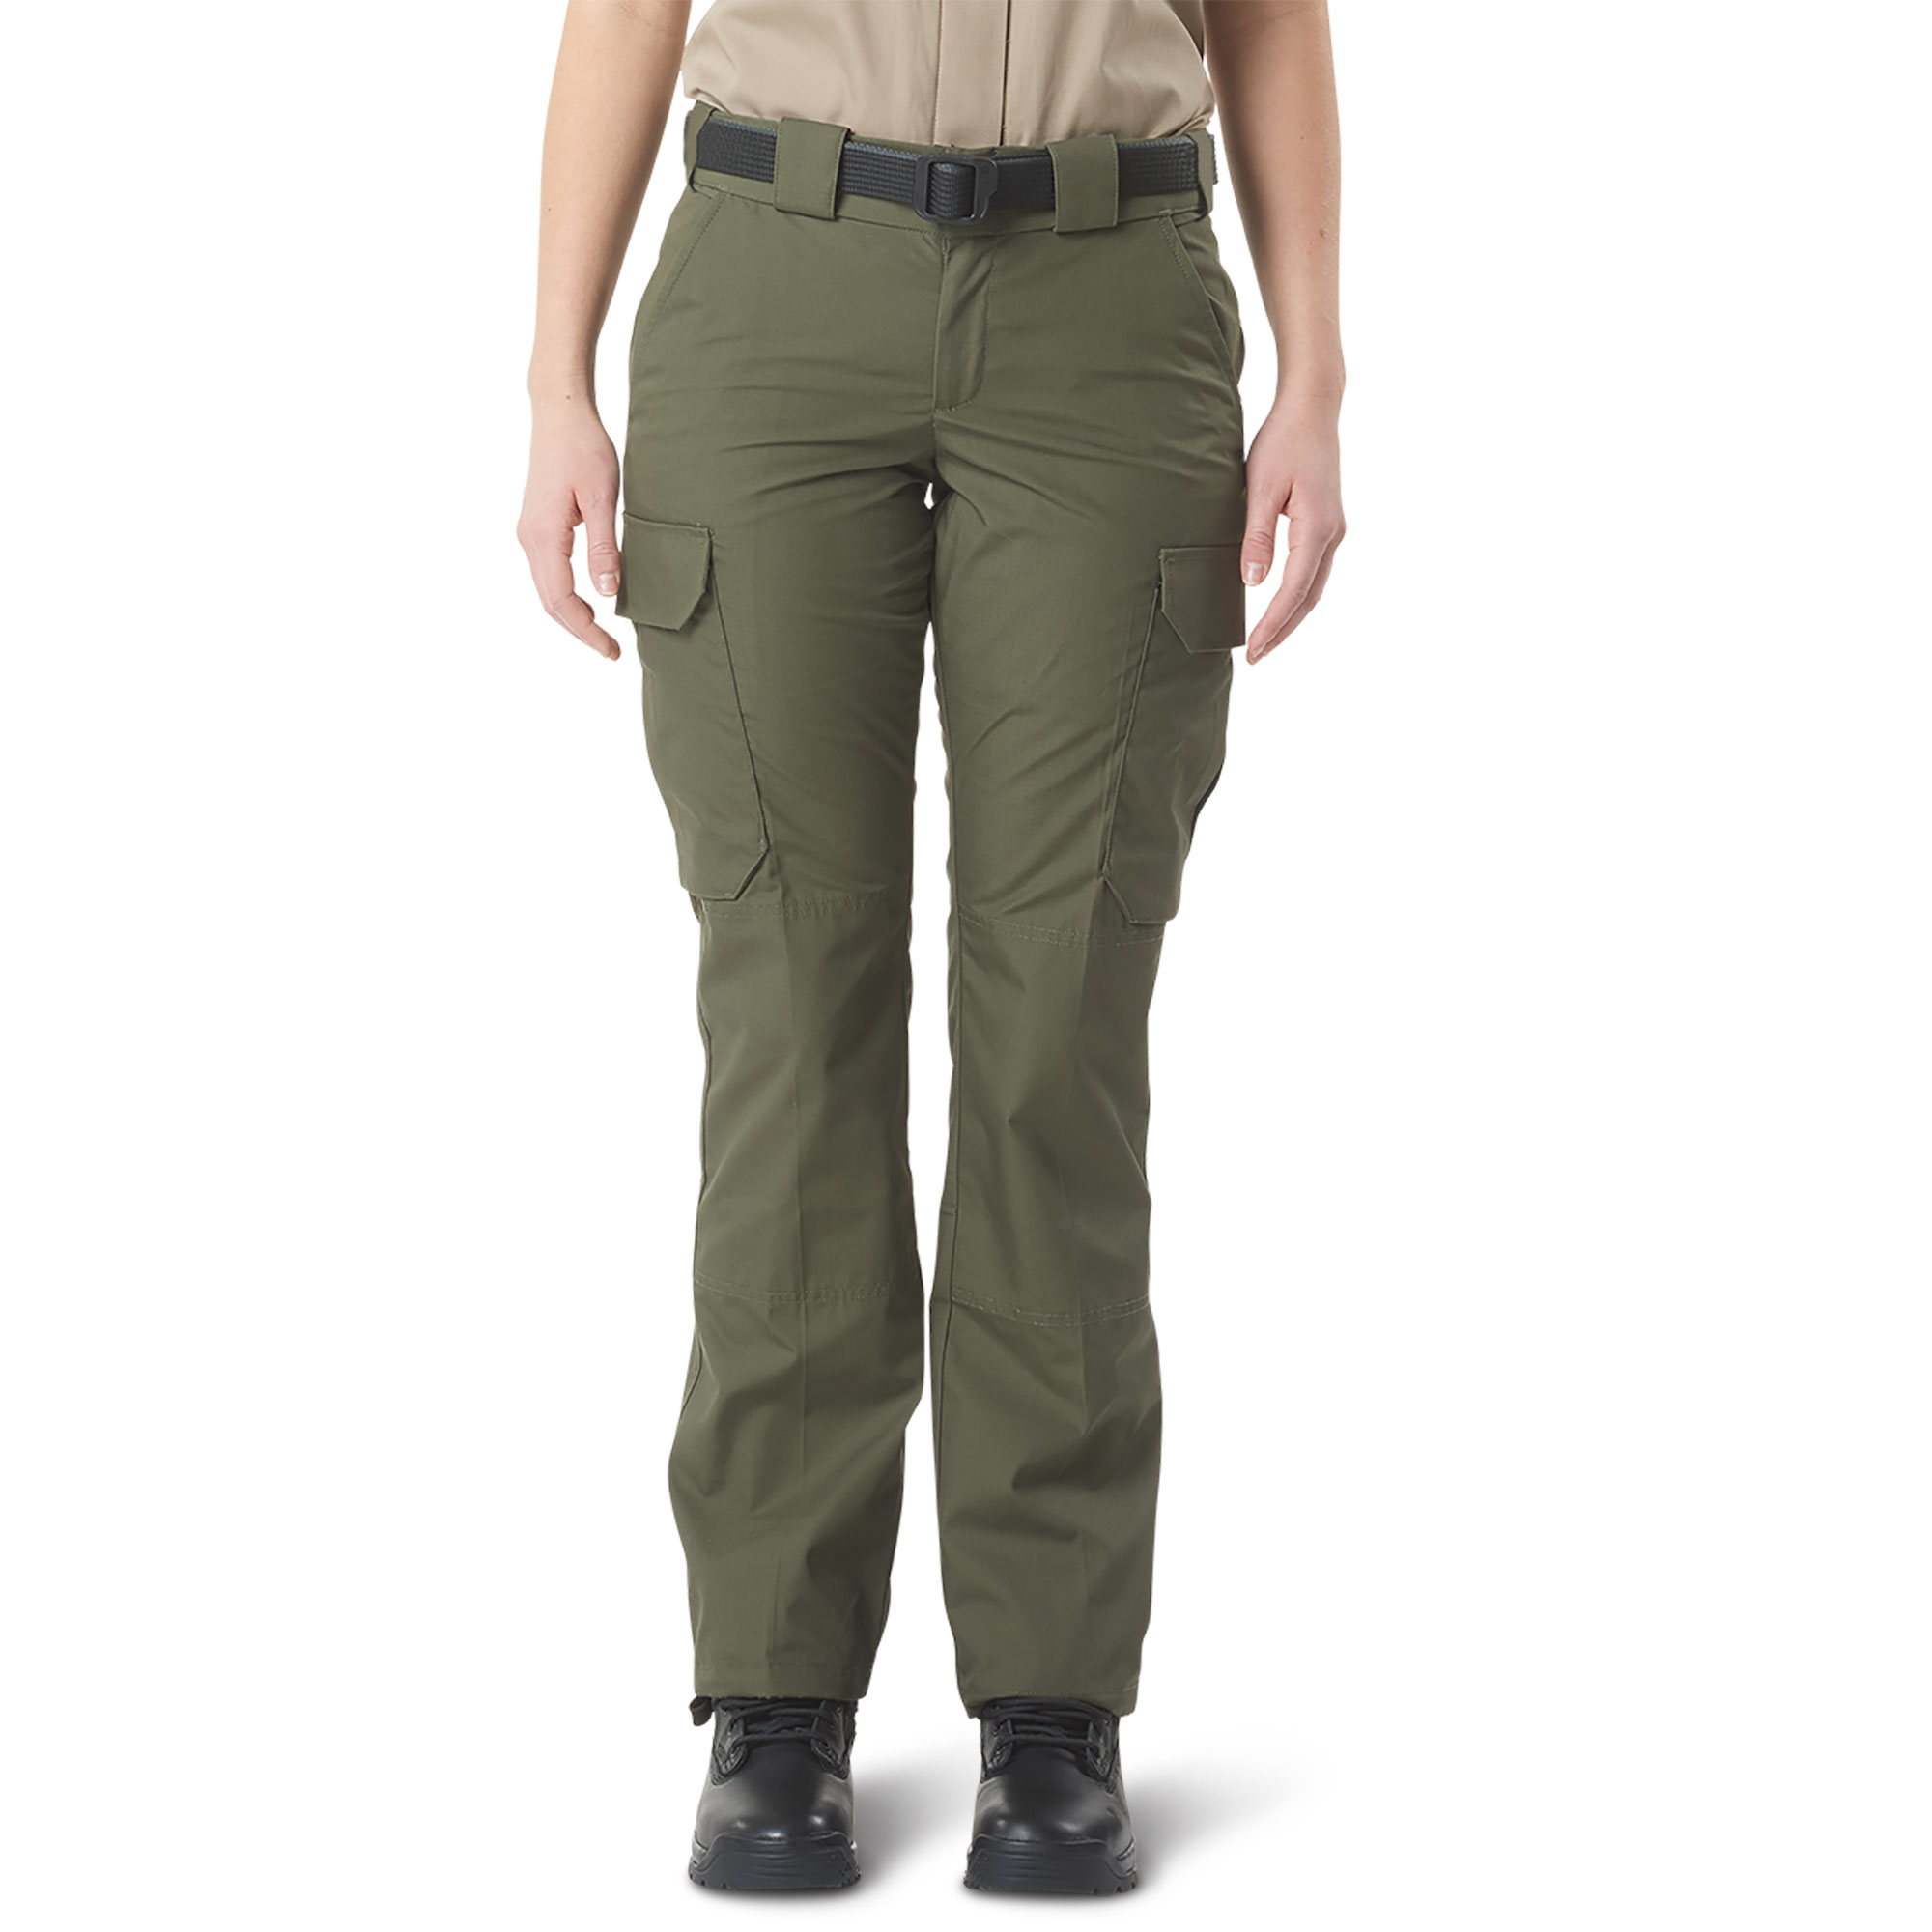 f959c6c1cbf66 CDCR Women s Duty Cargo Pant - 5.11 Tactical